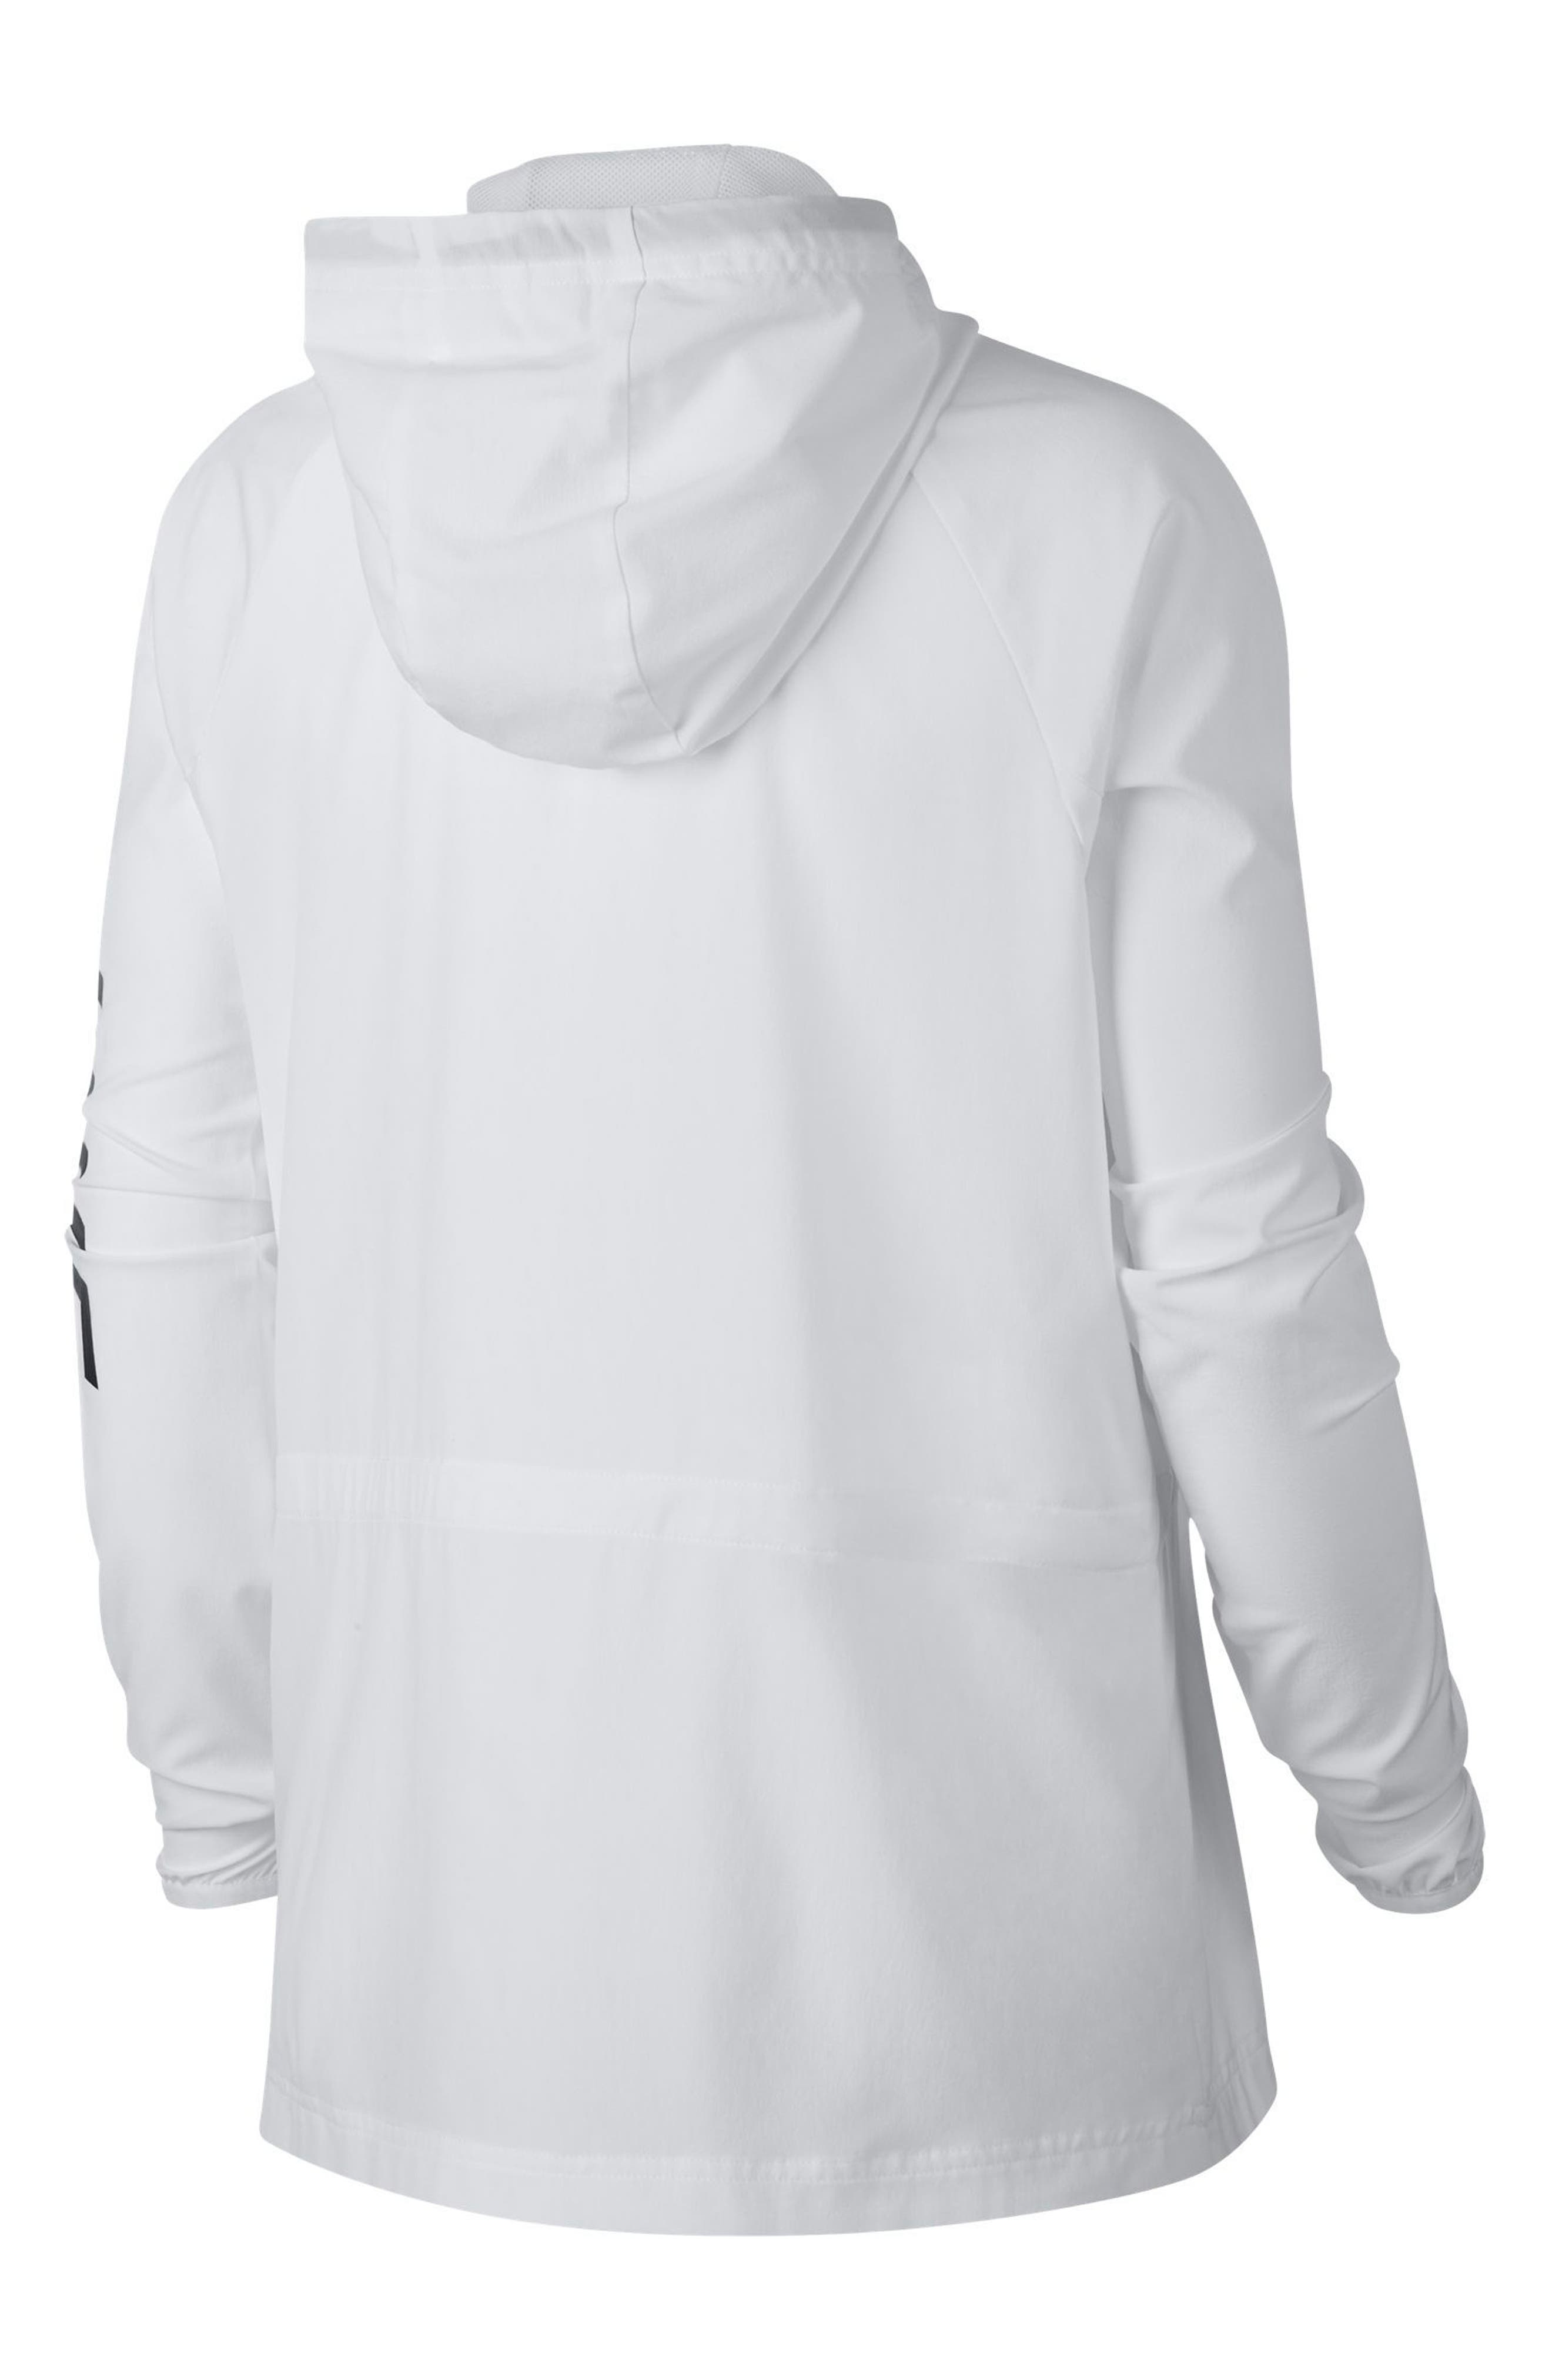 Flex Packable Hooded Training Jacket,                             Alternate thumbnail 9, color,                             100